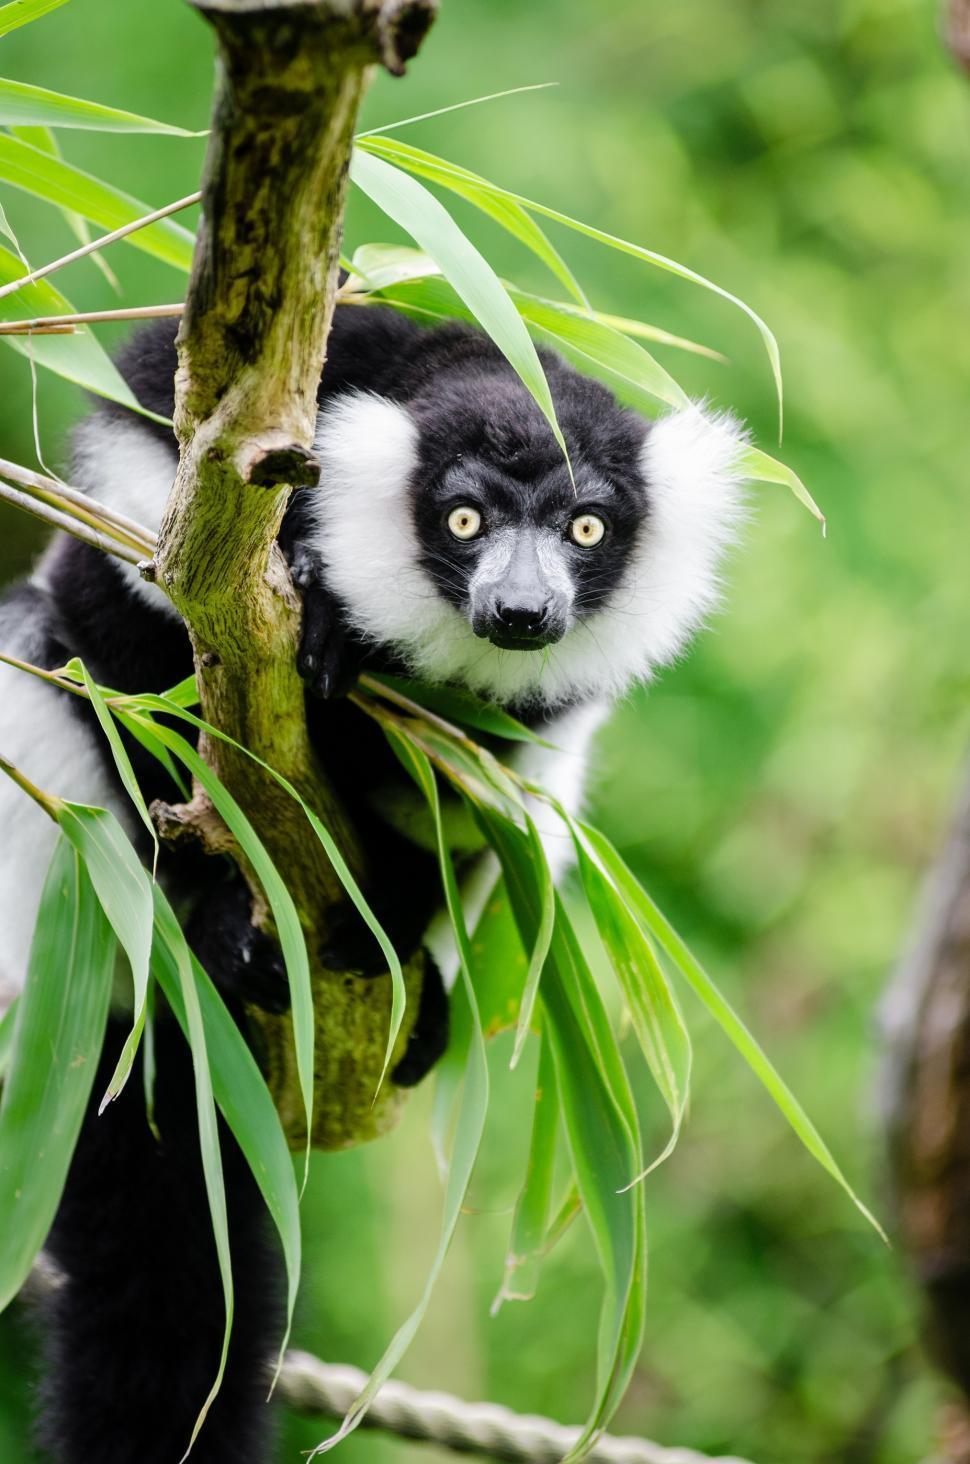 Download Free Stock Photo of lemur indri primate madagascar cat mammal